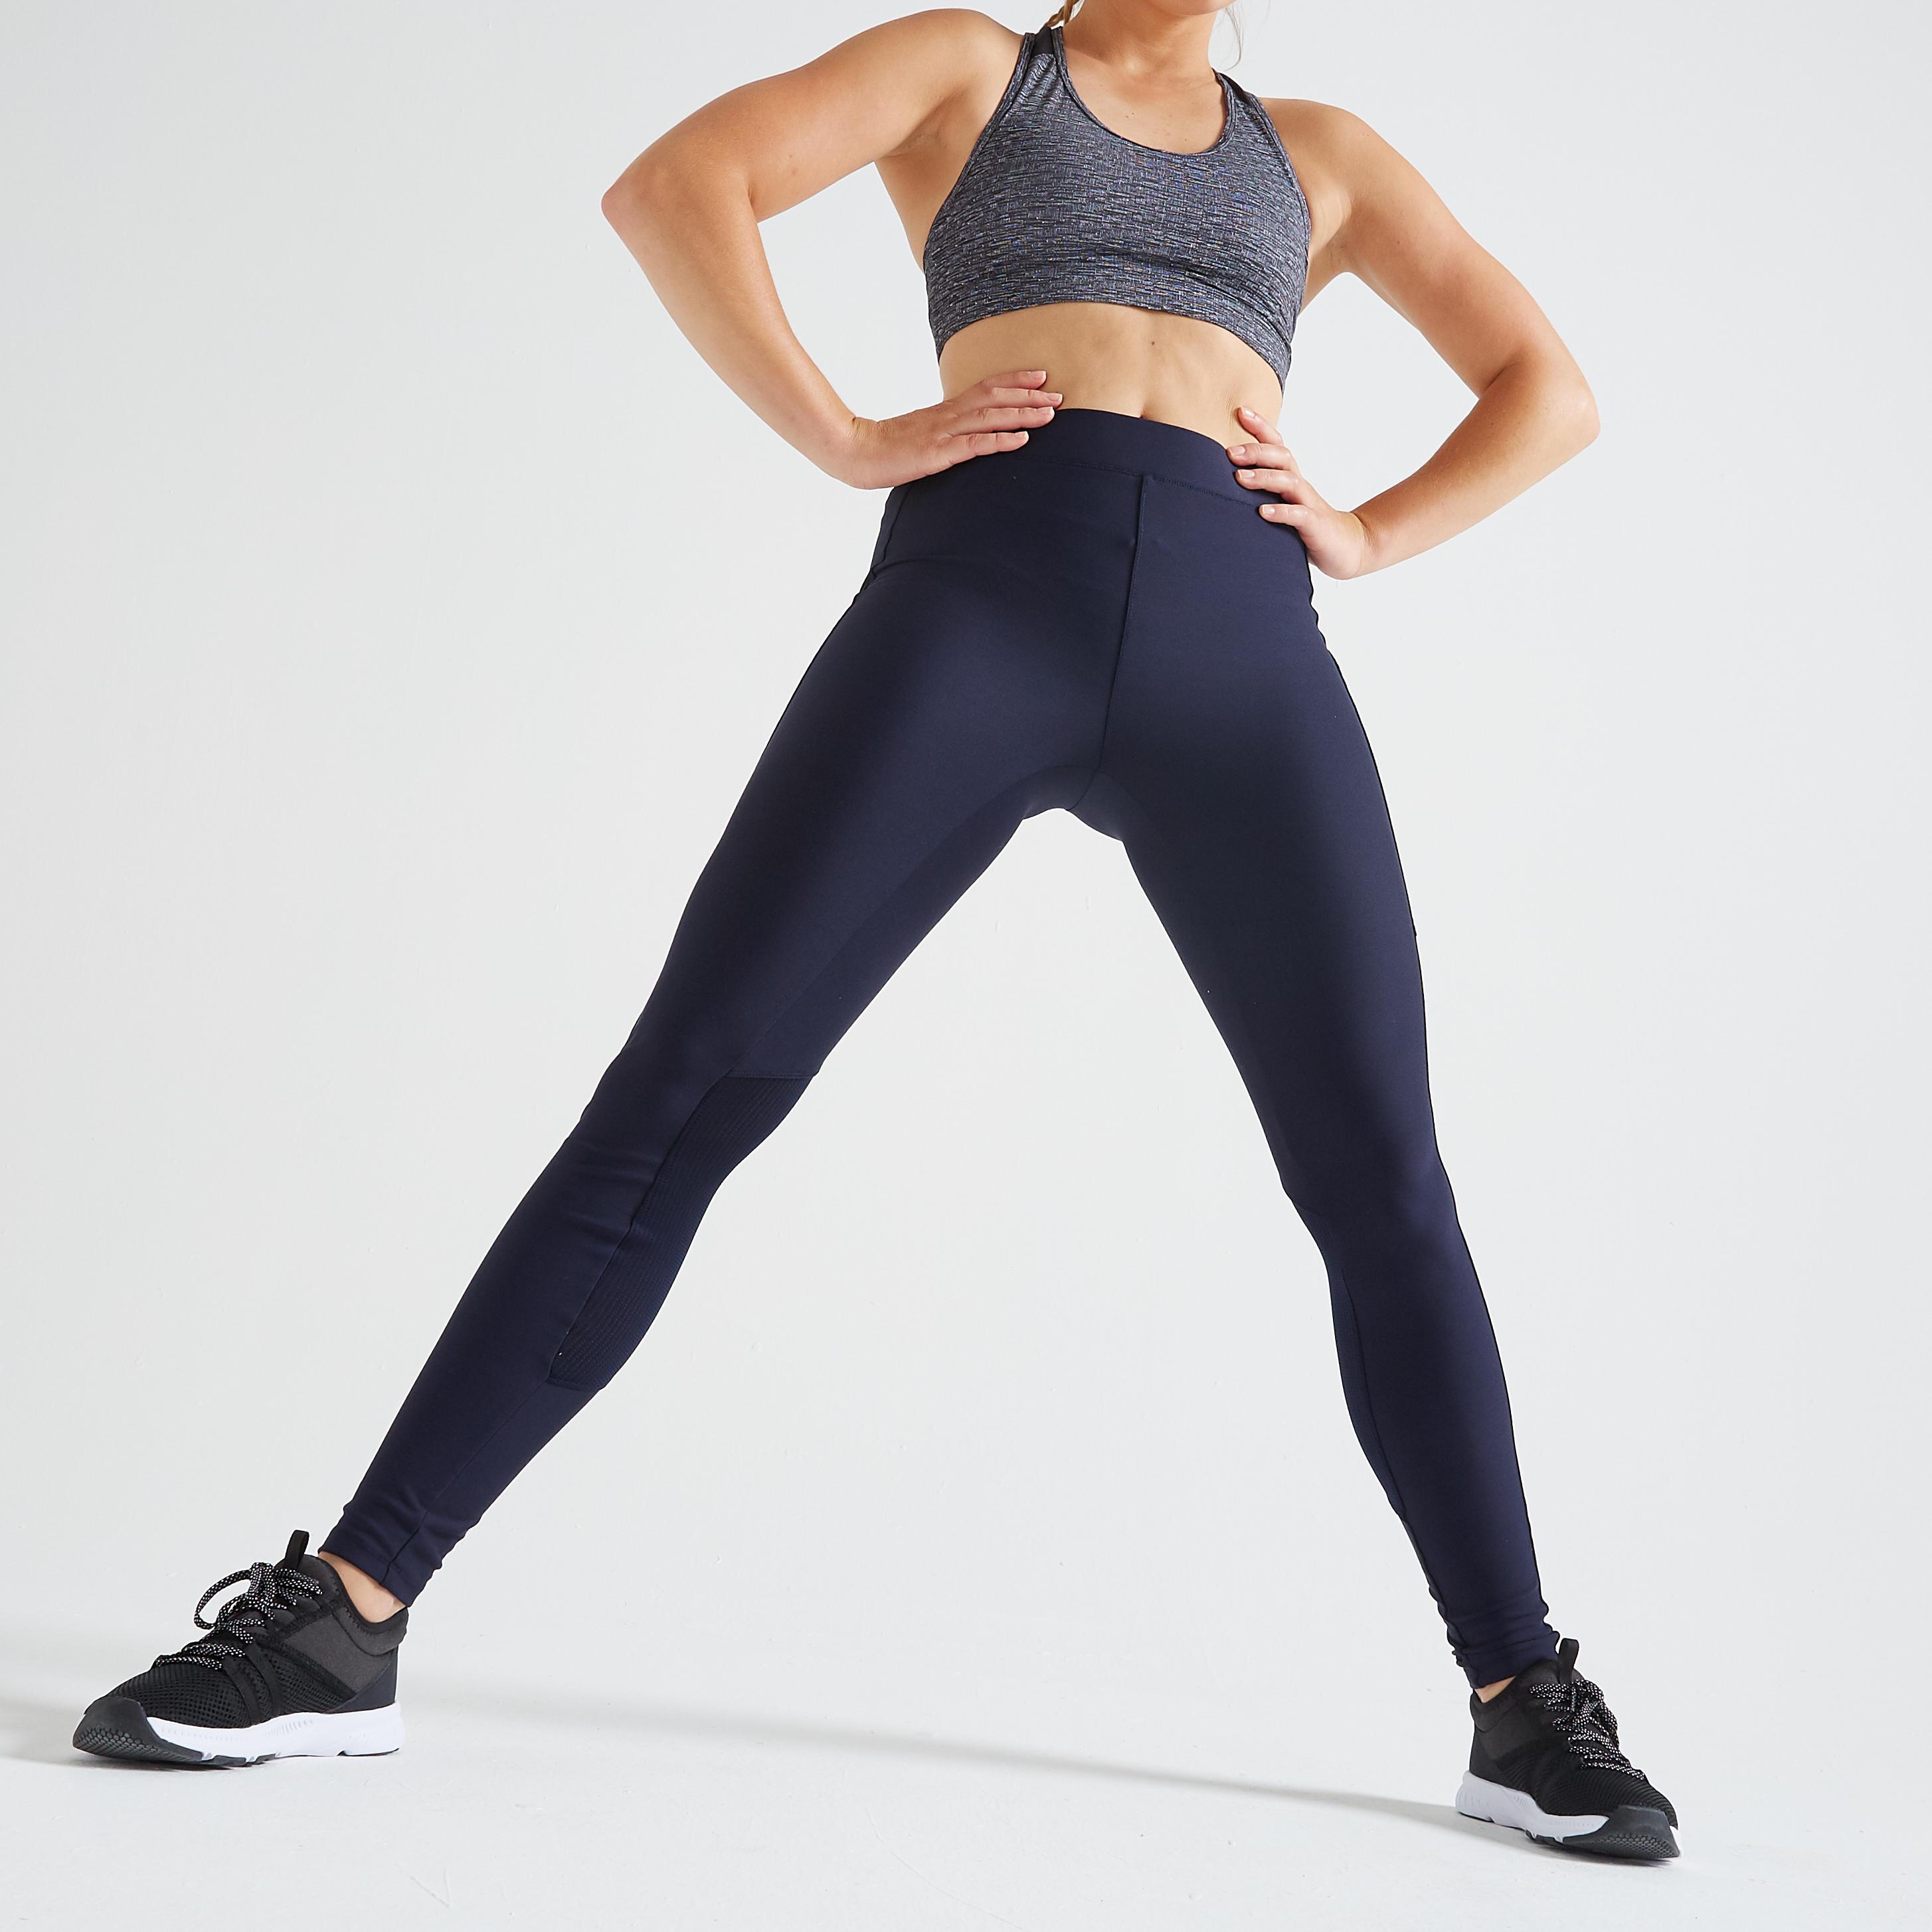 Colanți Fitness 120 Damă